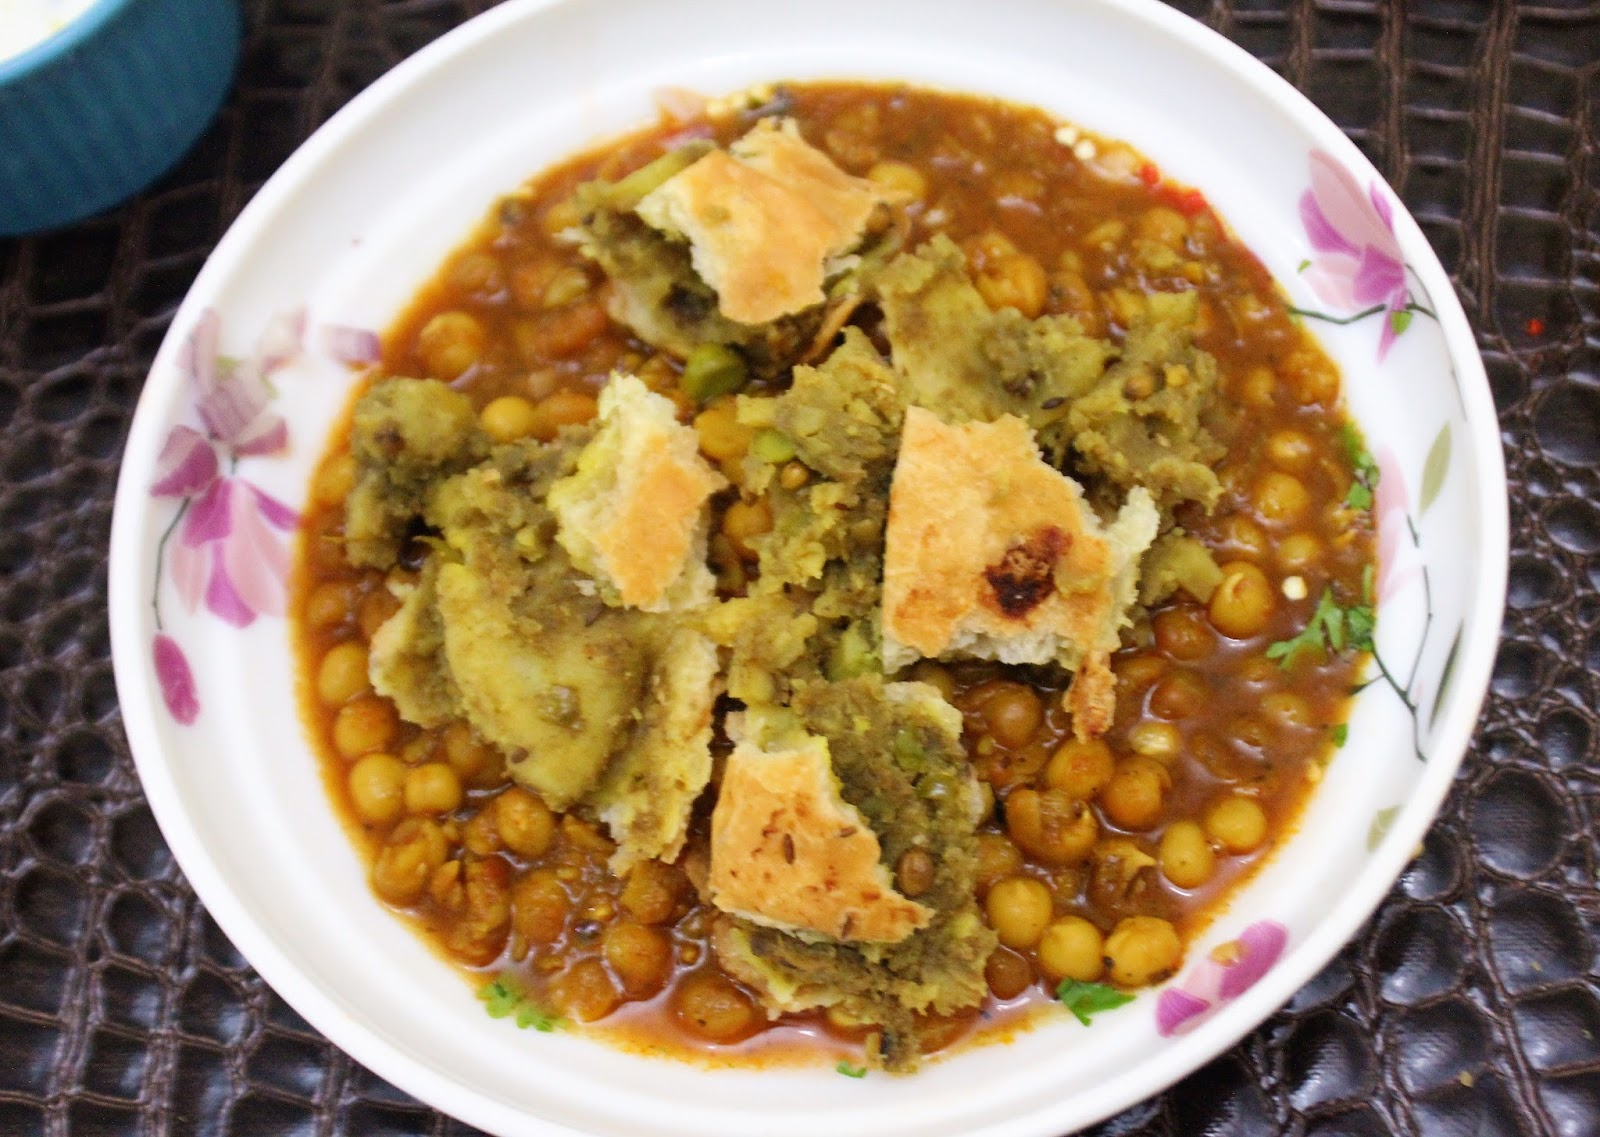 bethicas kitchen flavours ragda samosa chaat savoury